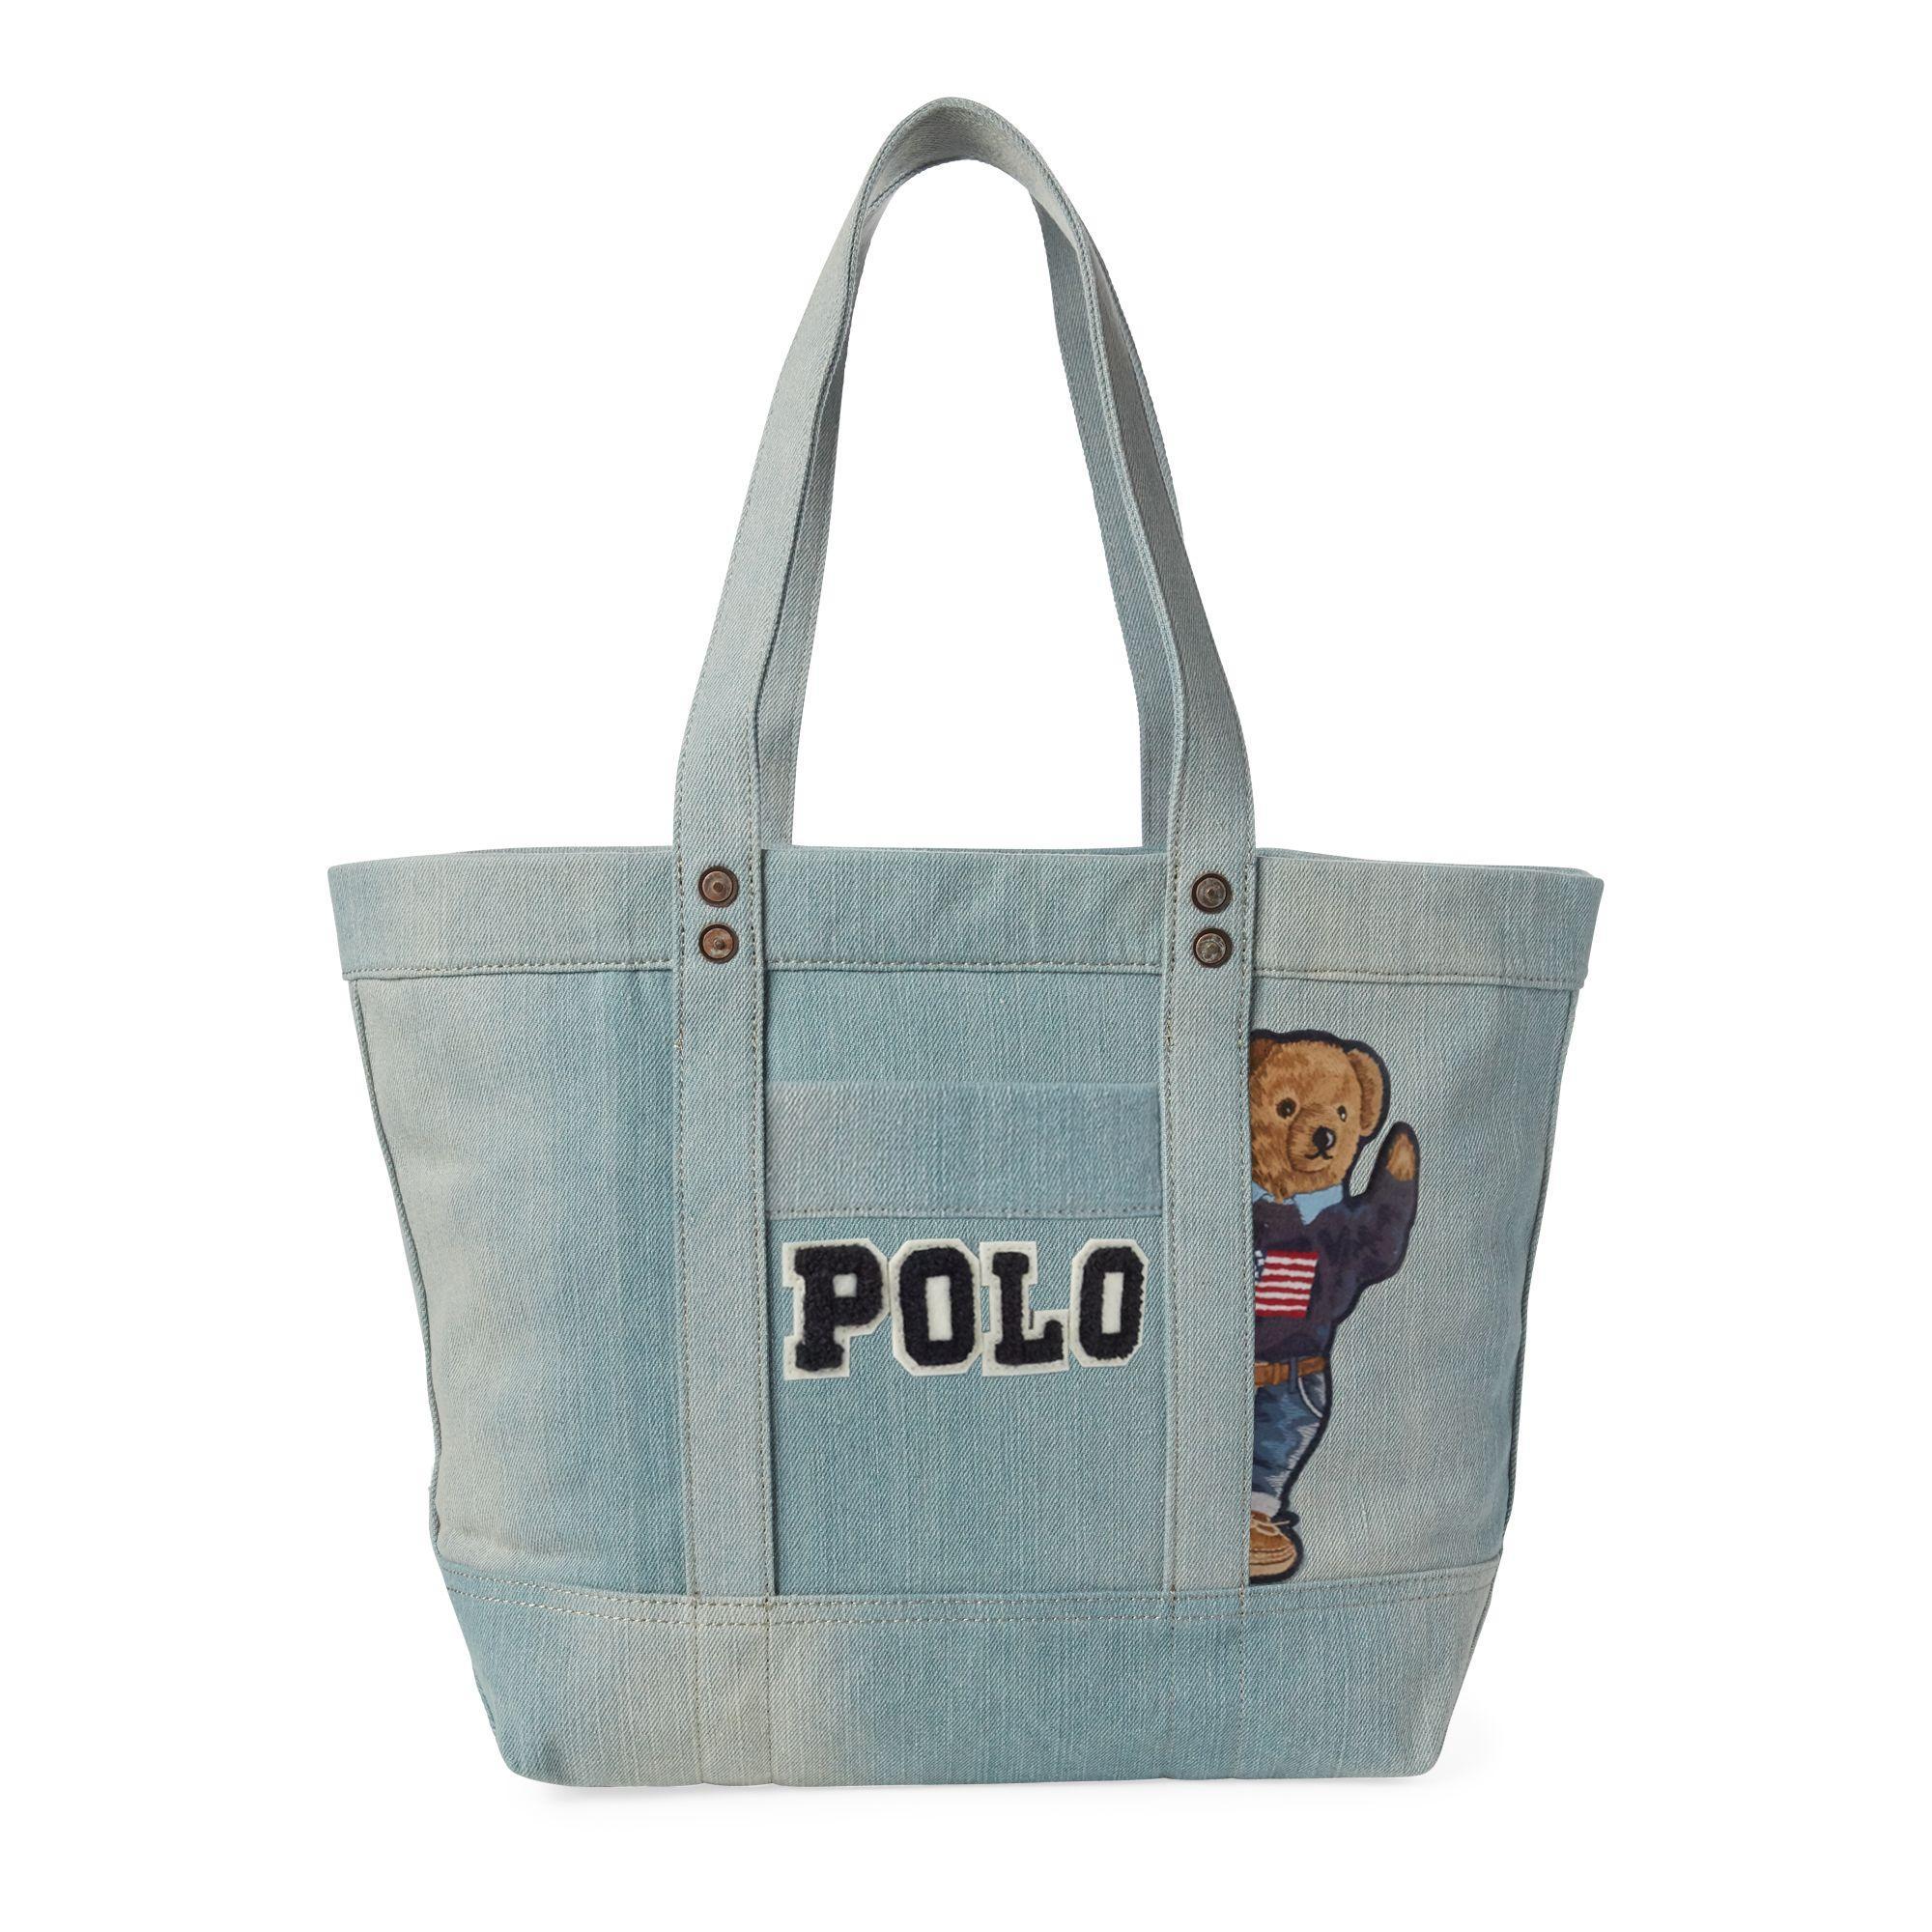 Lyst - Polo Ralph Lauren Canvas Polo Bear Tote Bag in Blue fe05d5ae41